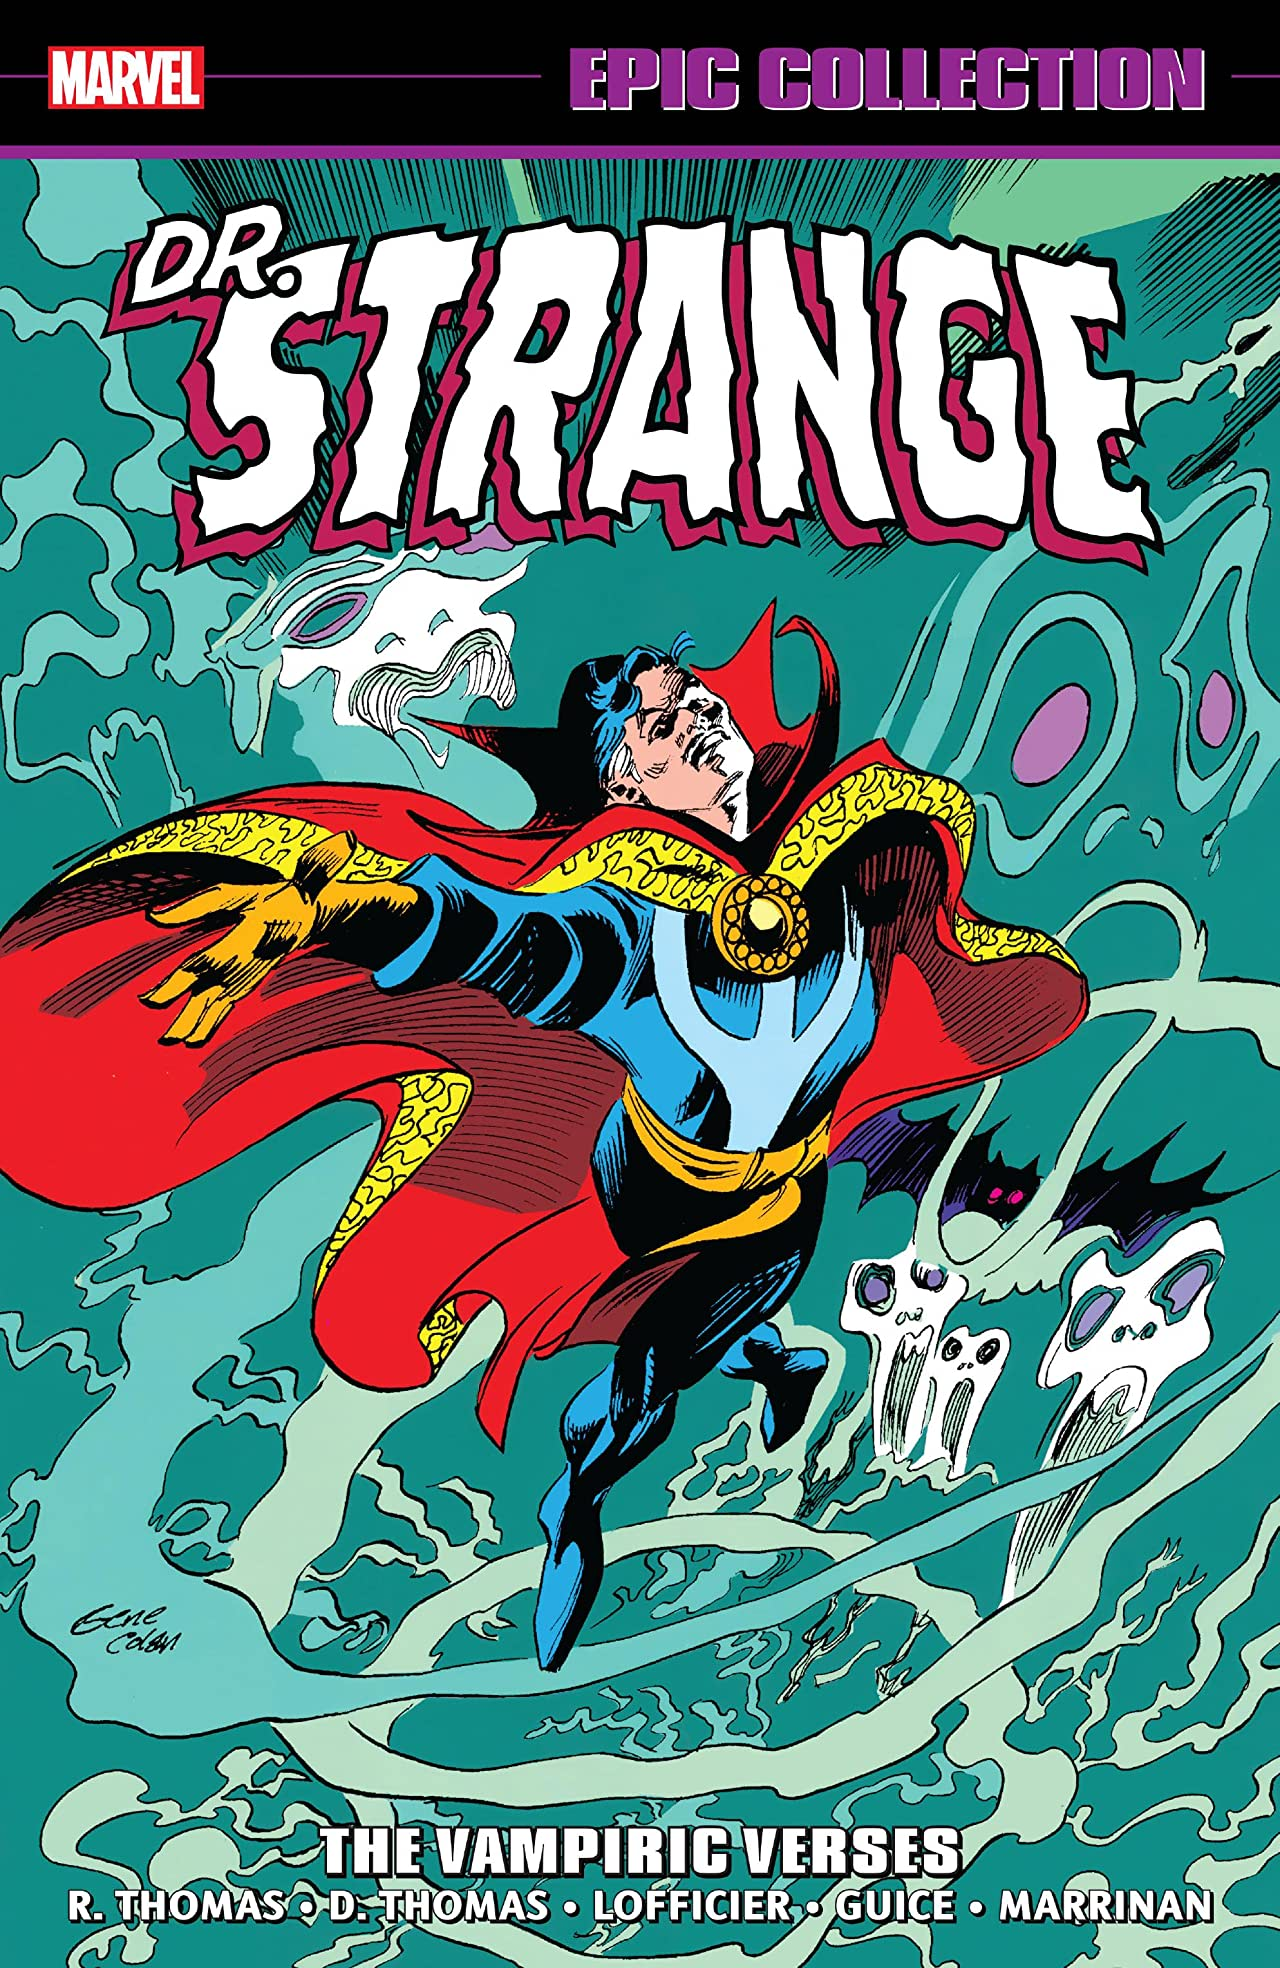 Doctor Strange Epic Collection: The Vampiric Verses (Trade Paperback)